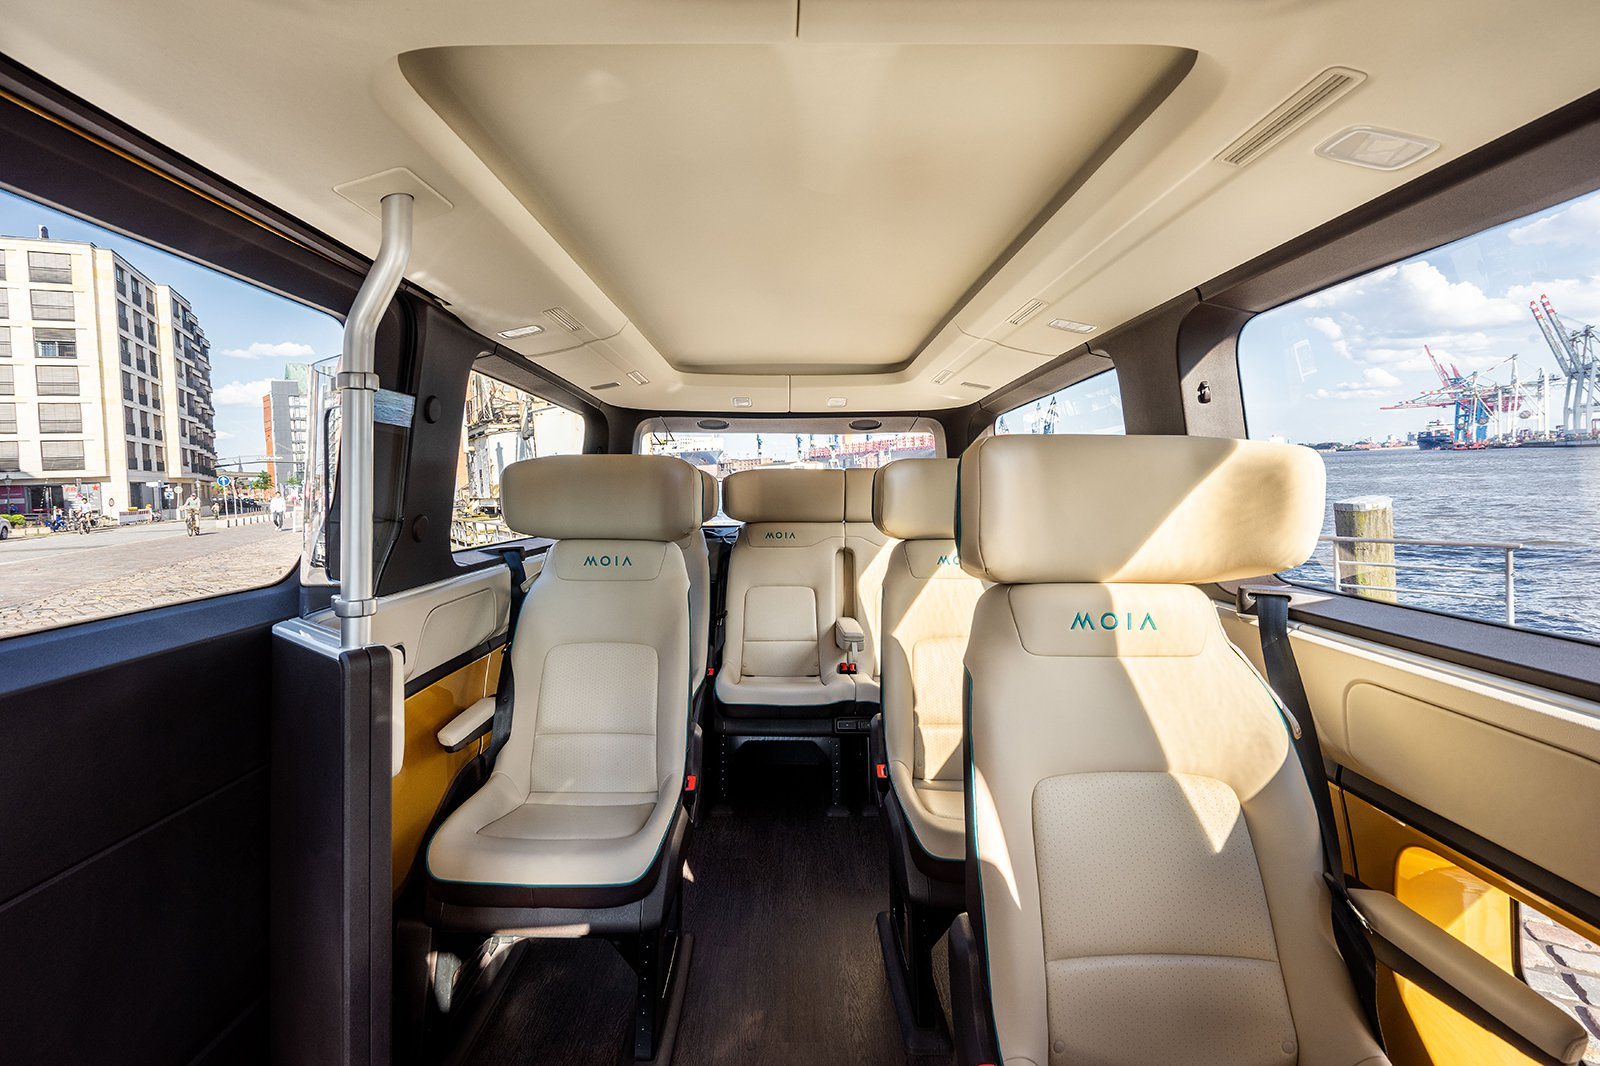 VW MOIA Interior